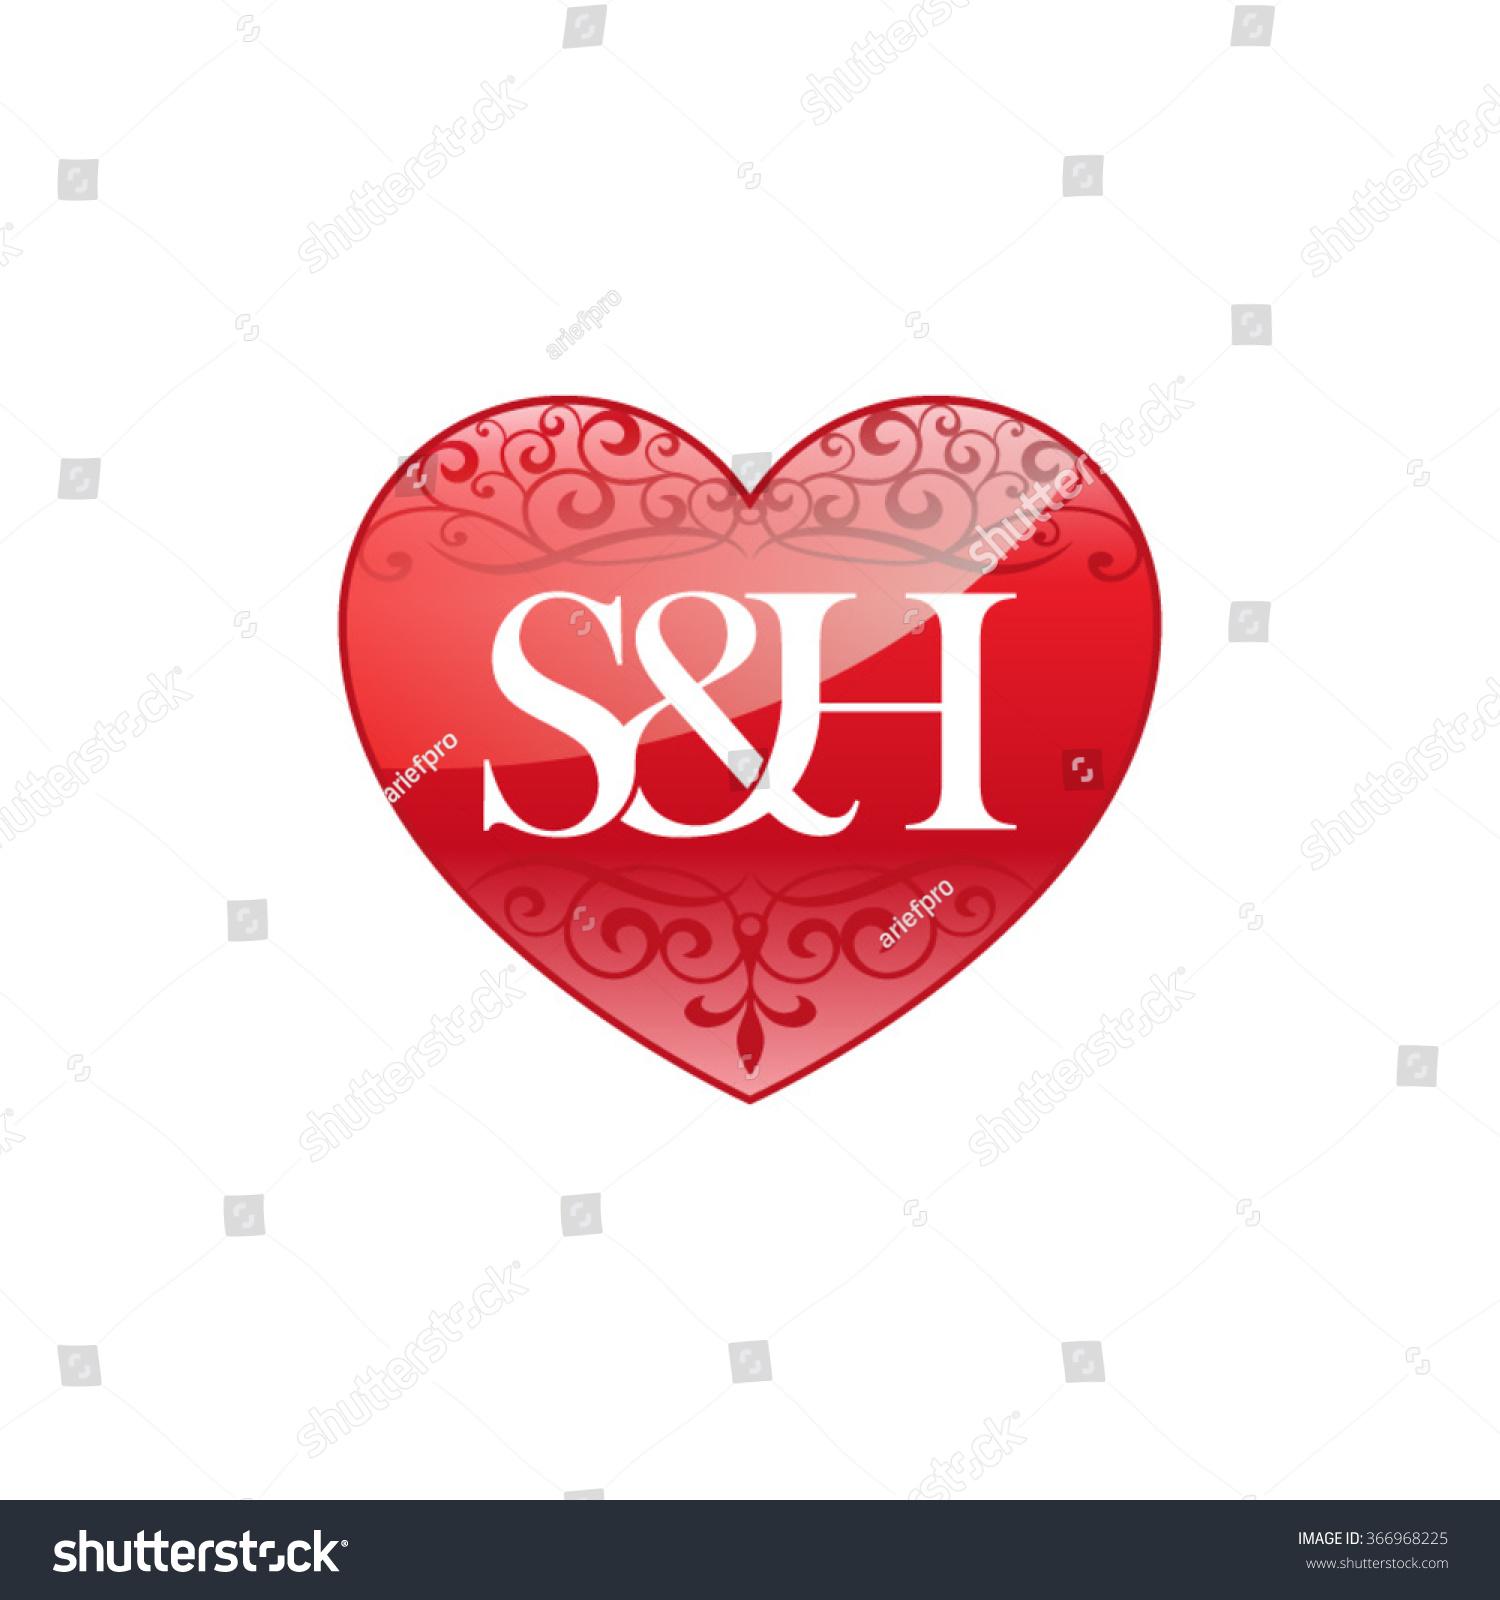 sh initial letter logo ornament heart stock vector. Black Bedroom Furniture Sets. Home Design Ideas